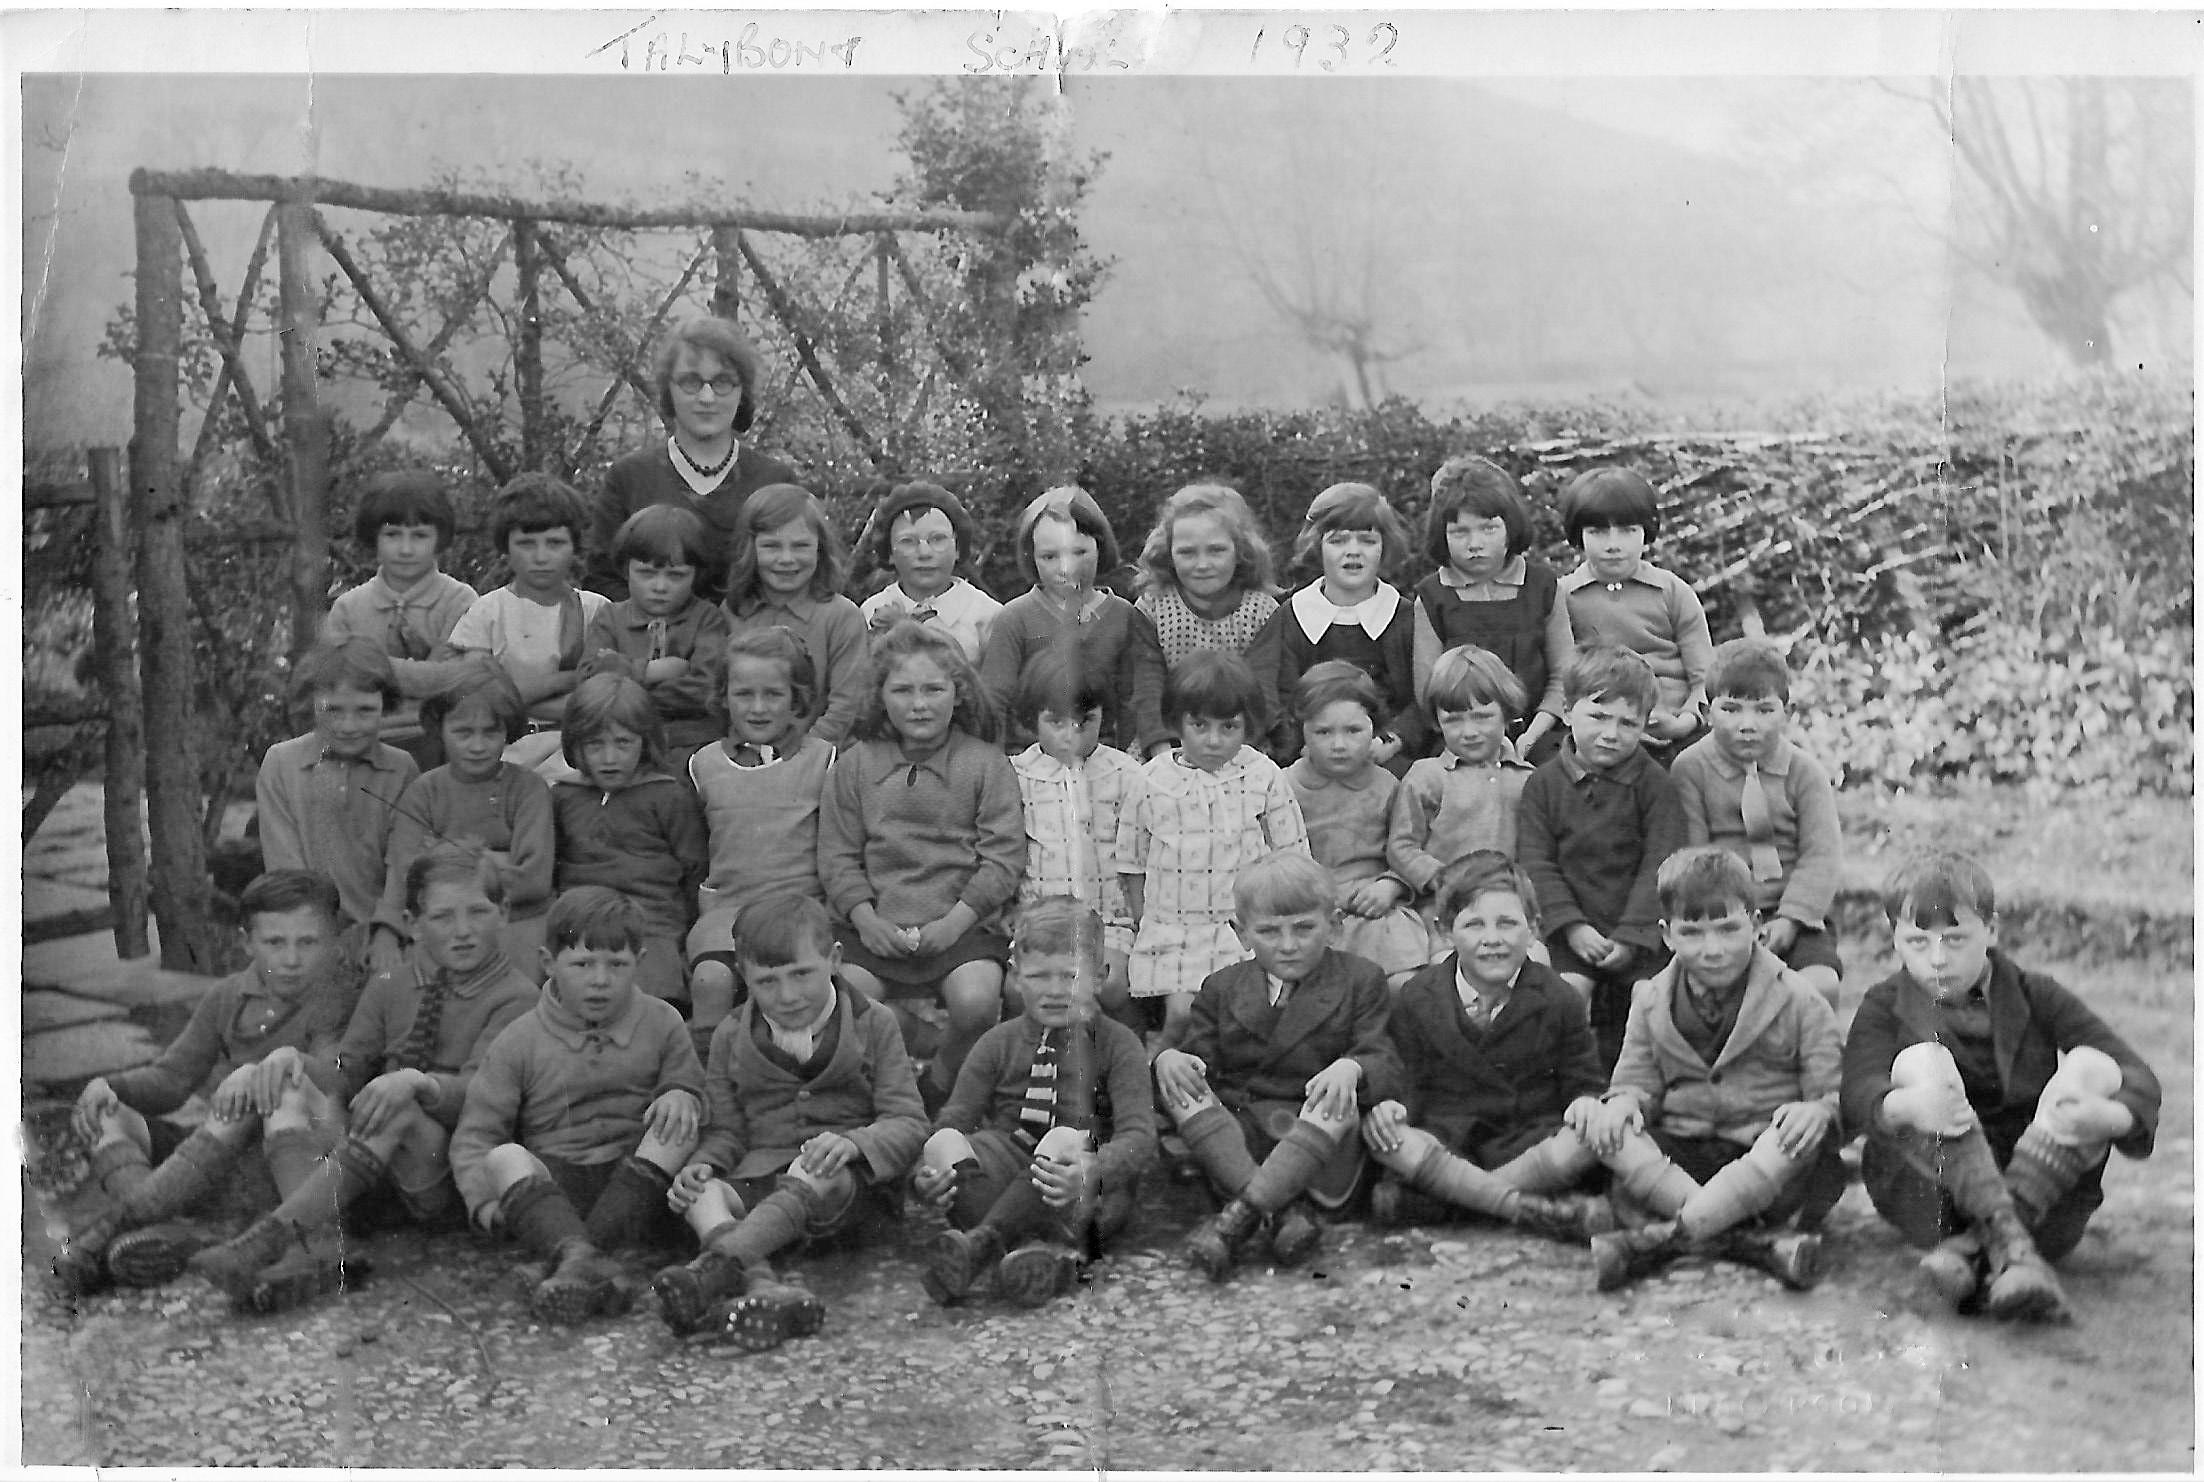 Talybont School 1932